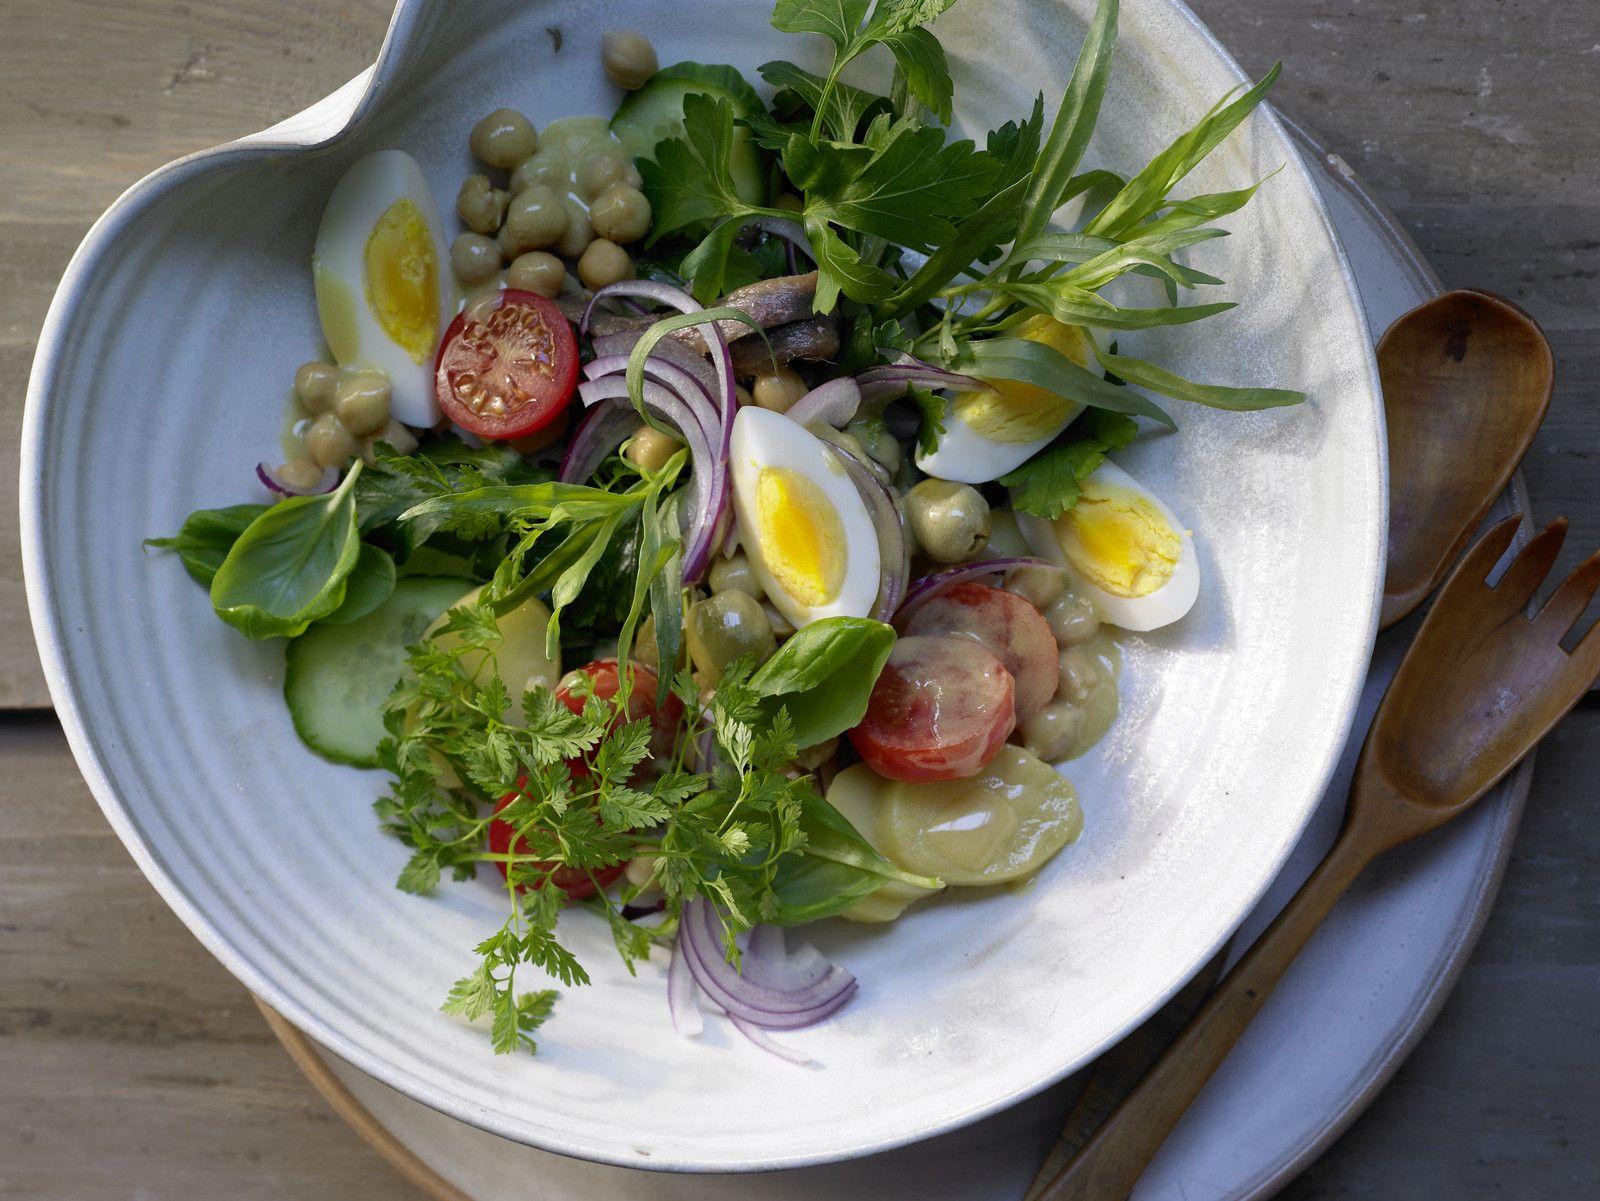 Kartoffel Kcal kräuter kartoffel salat rezept eat smarter